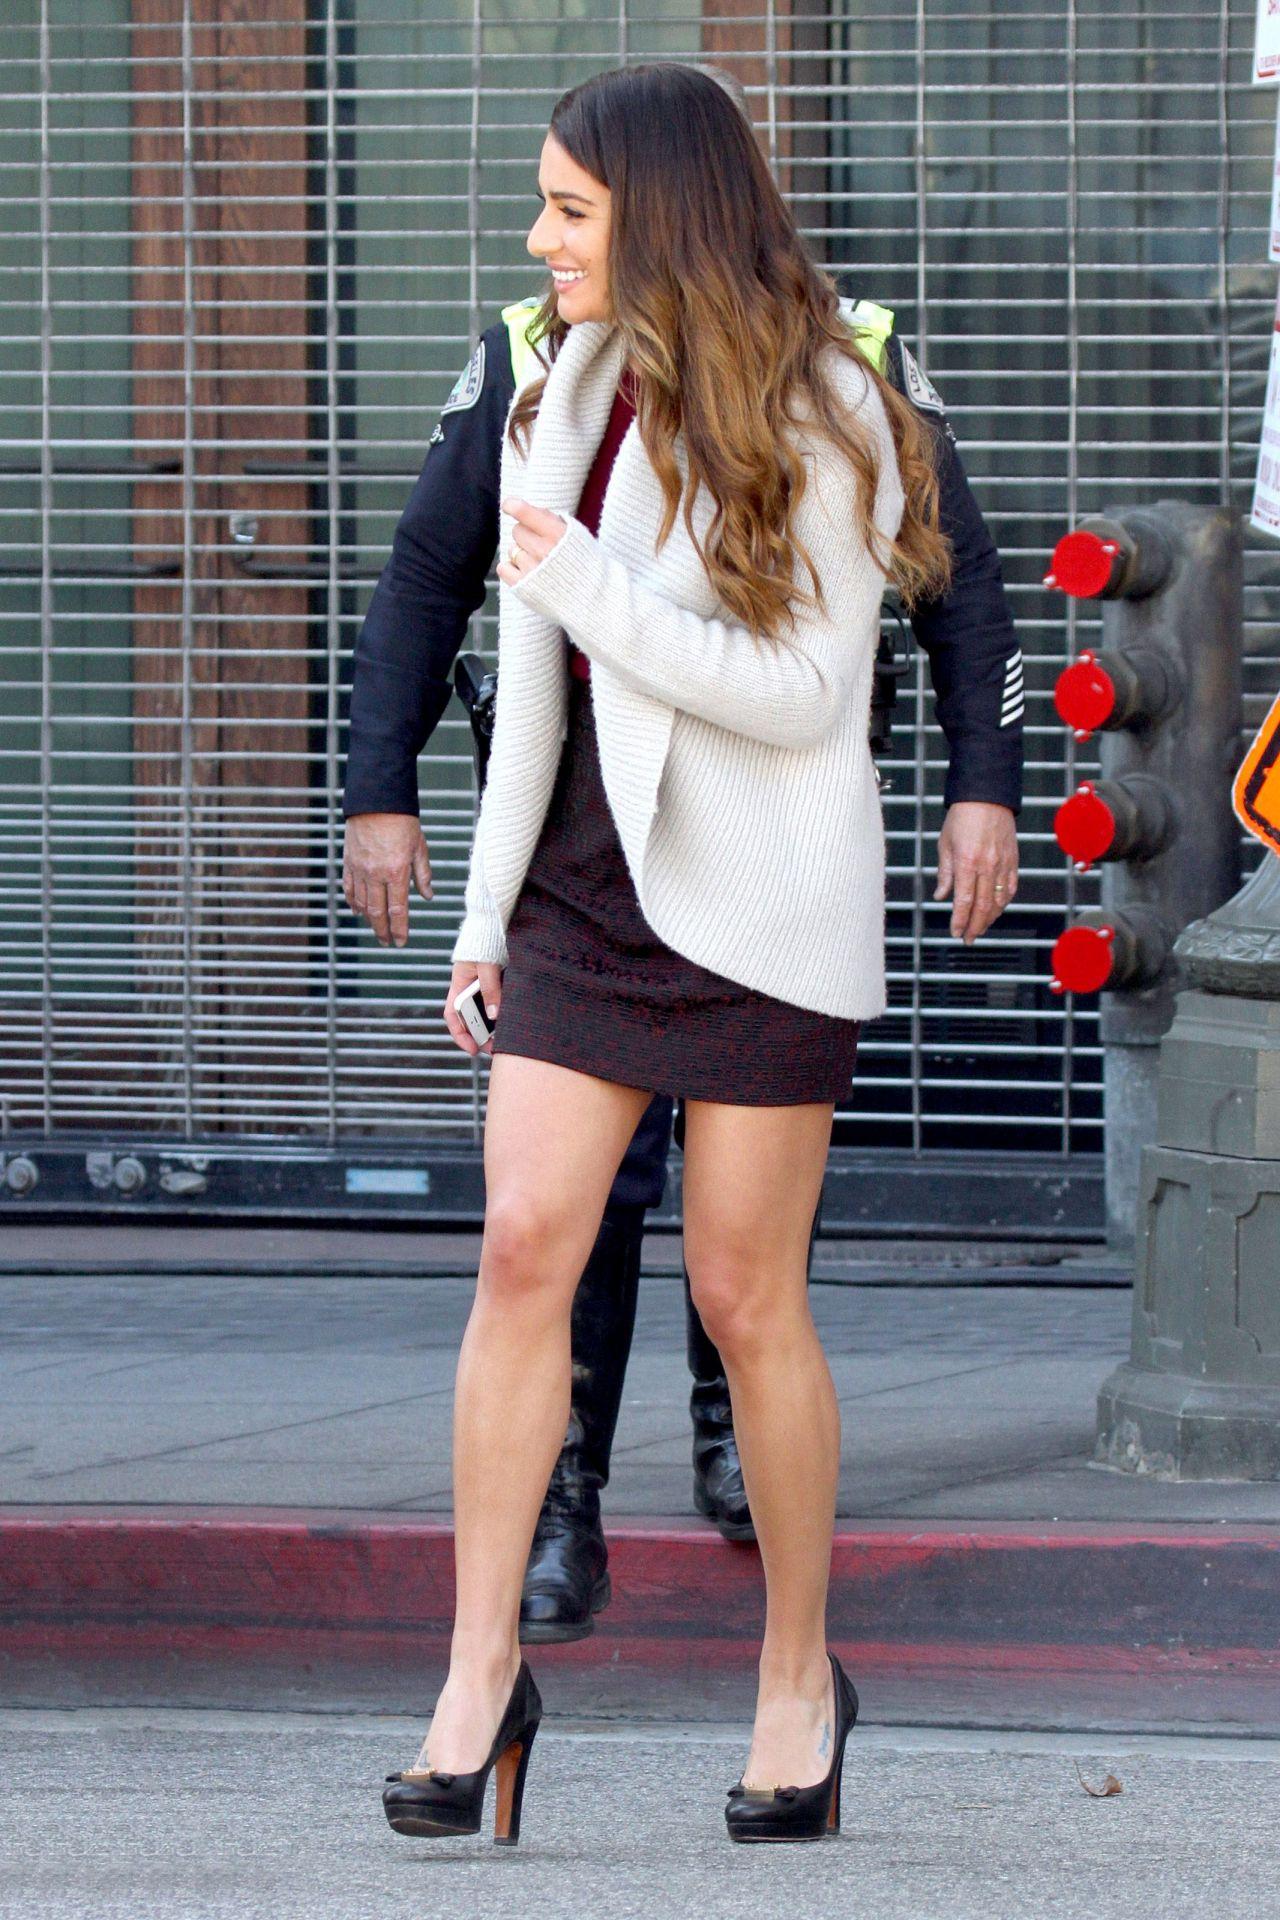 Lea Michele Glee Set Photos Los Angeles February 2014